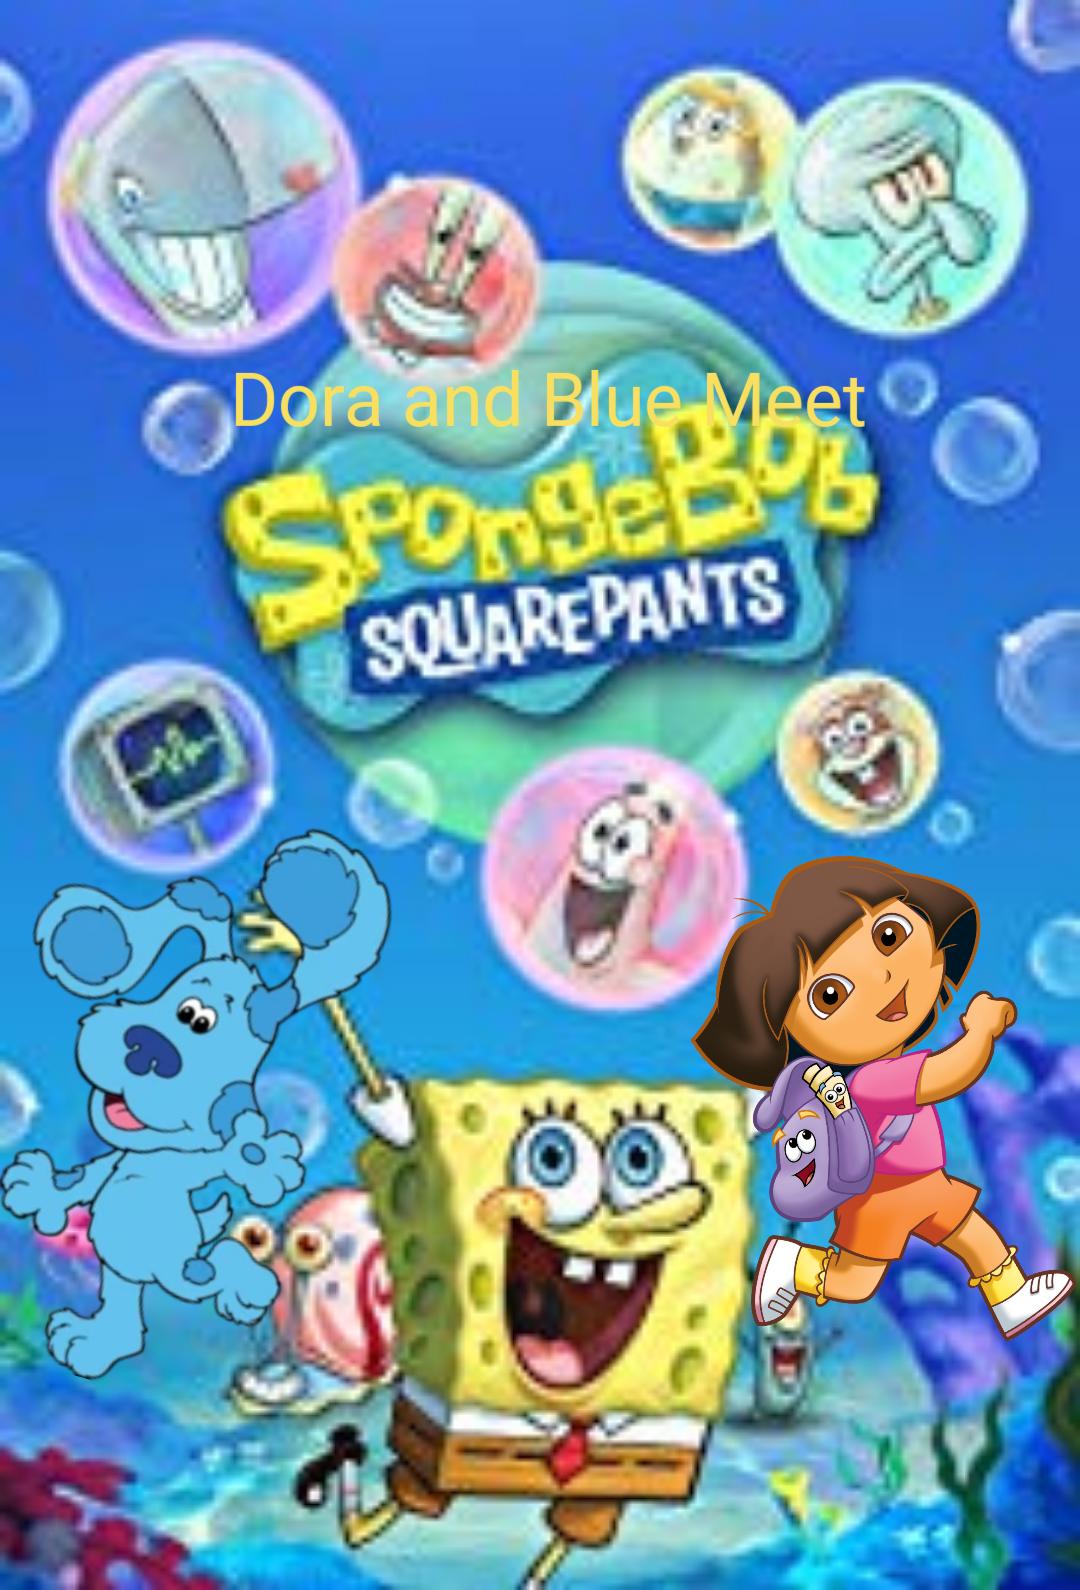 Dora and Blue Meet SpongeBob SquarePants